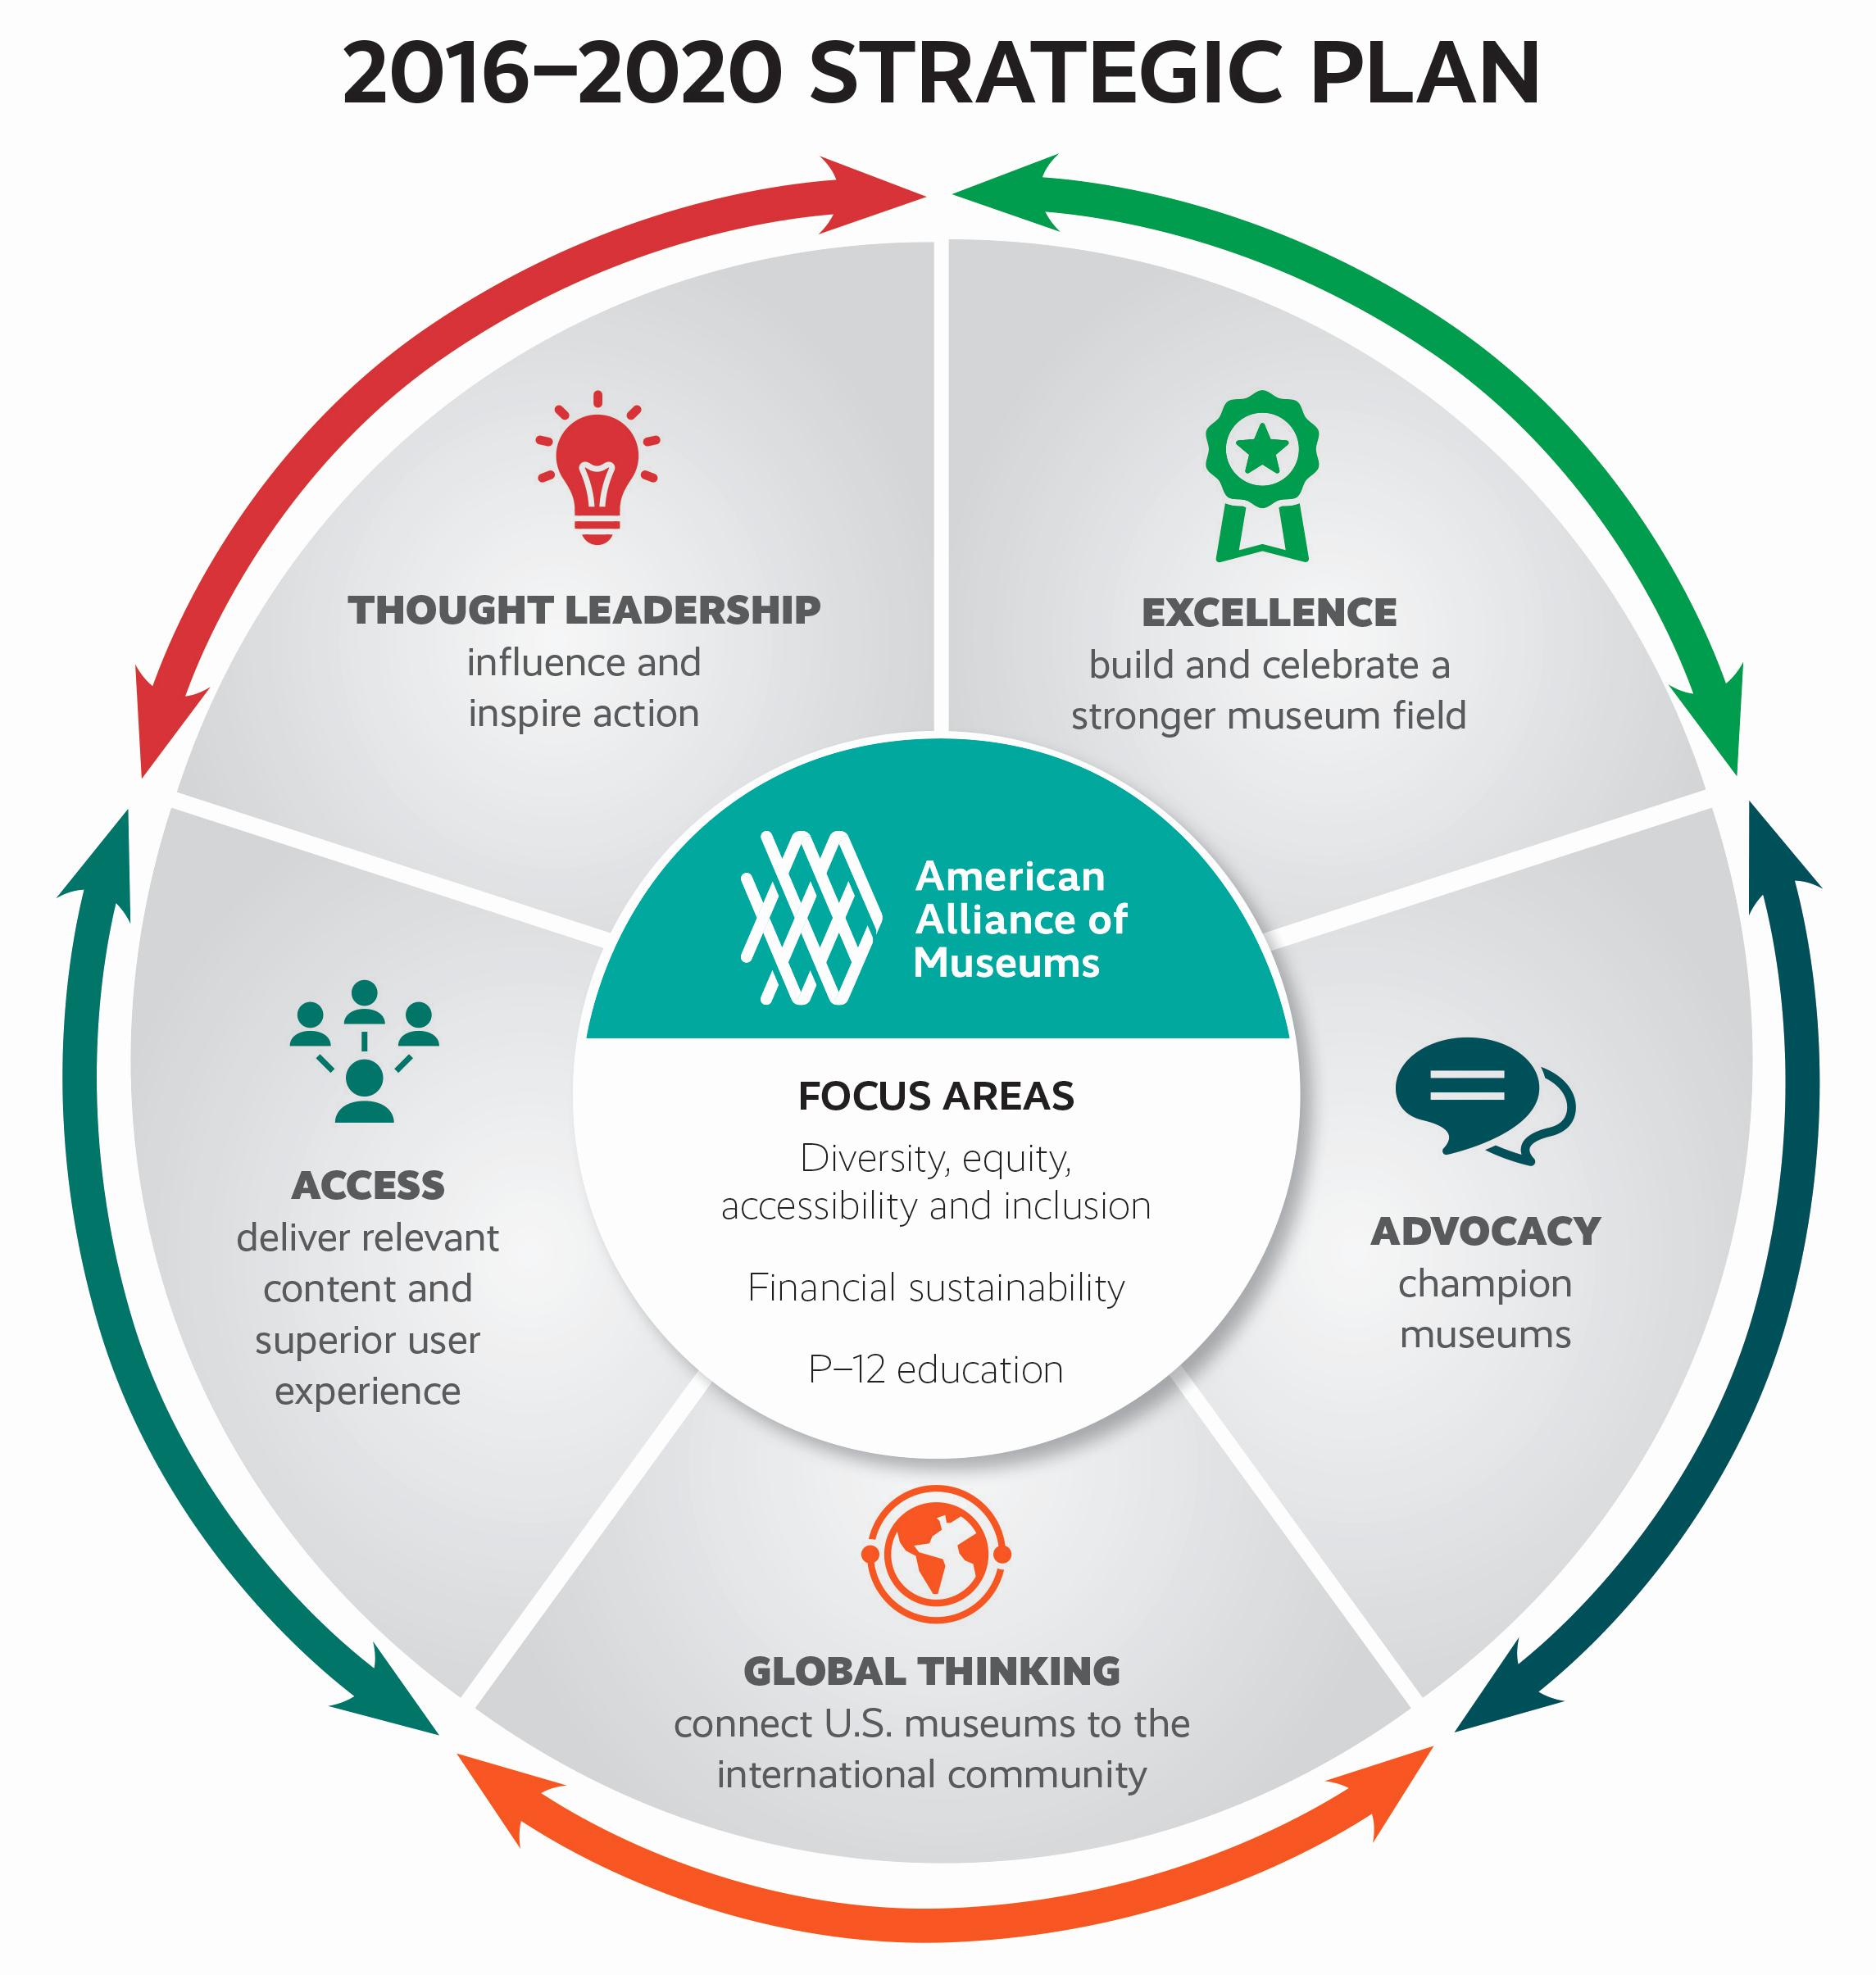 Strategic Plan Template Free Elegant Strategic Plan Graphic Google Search